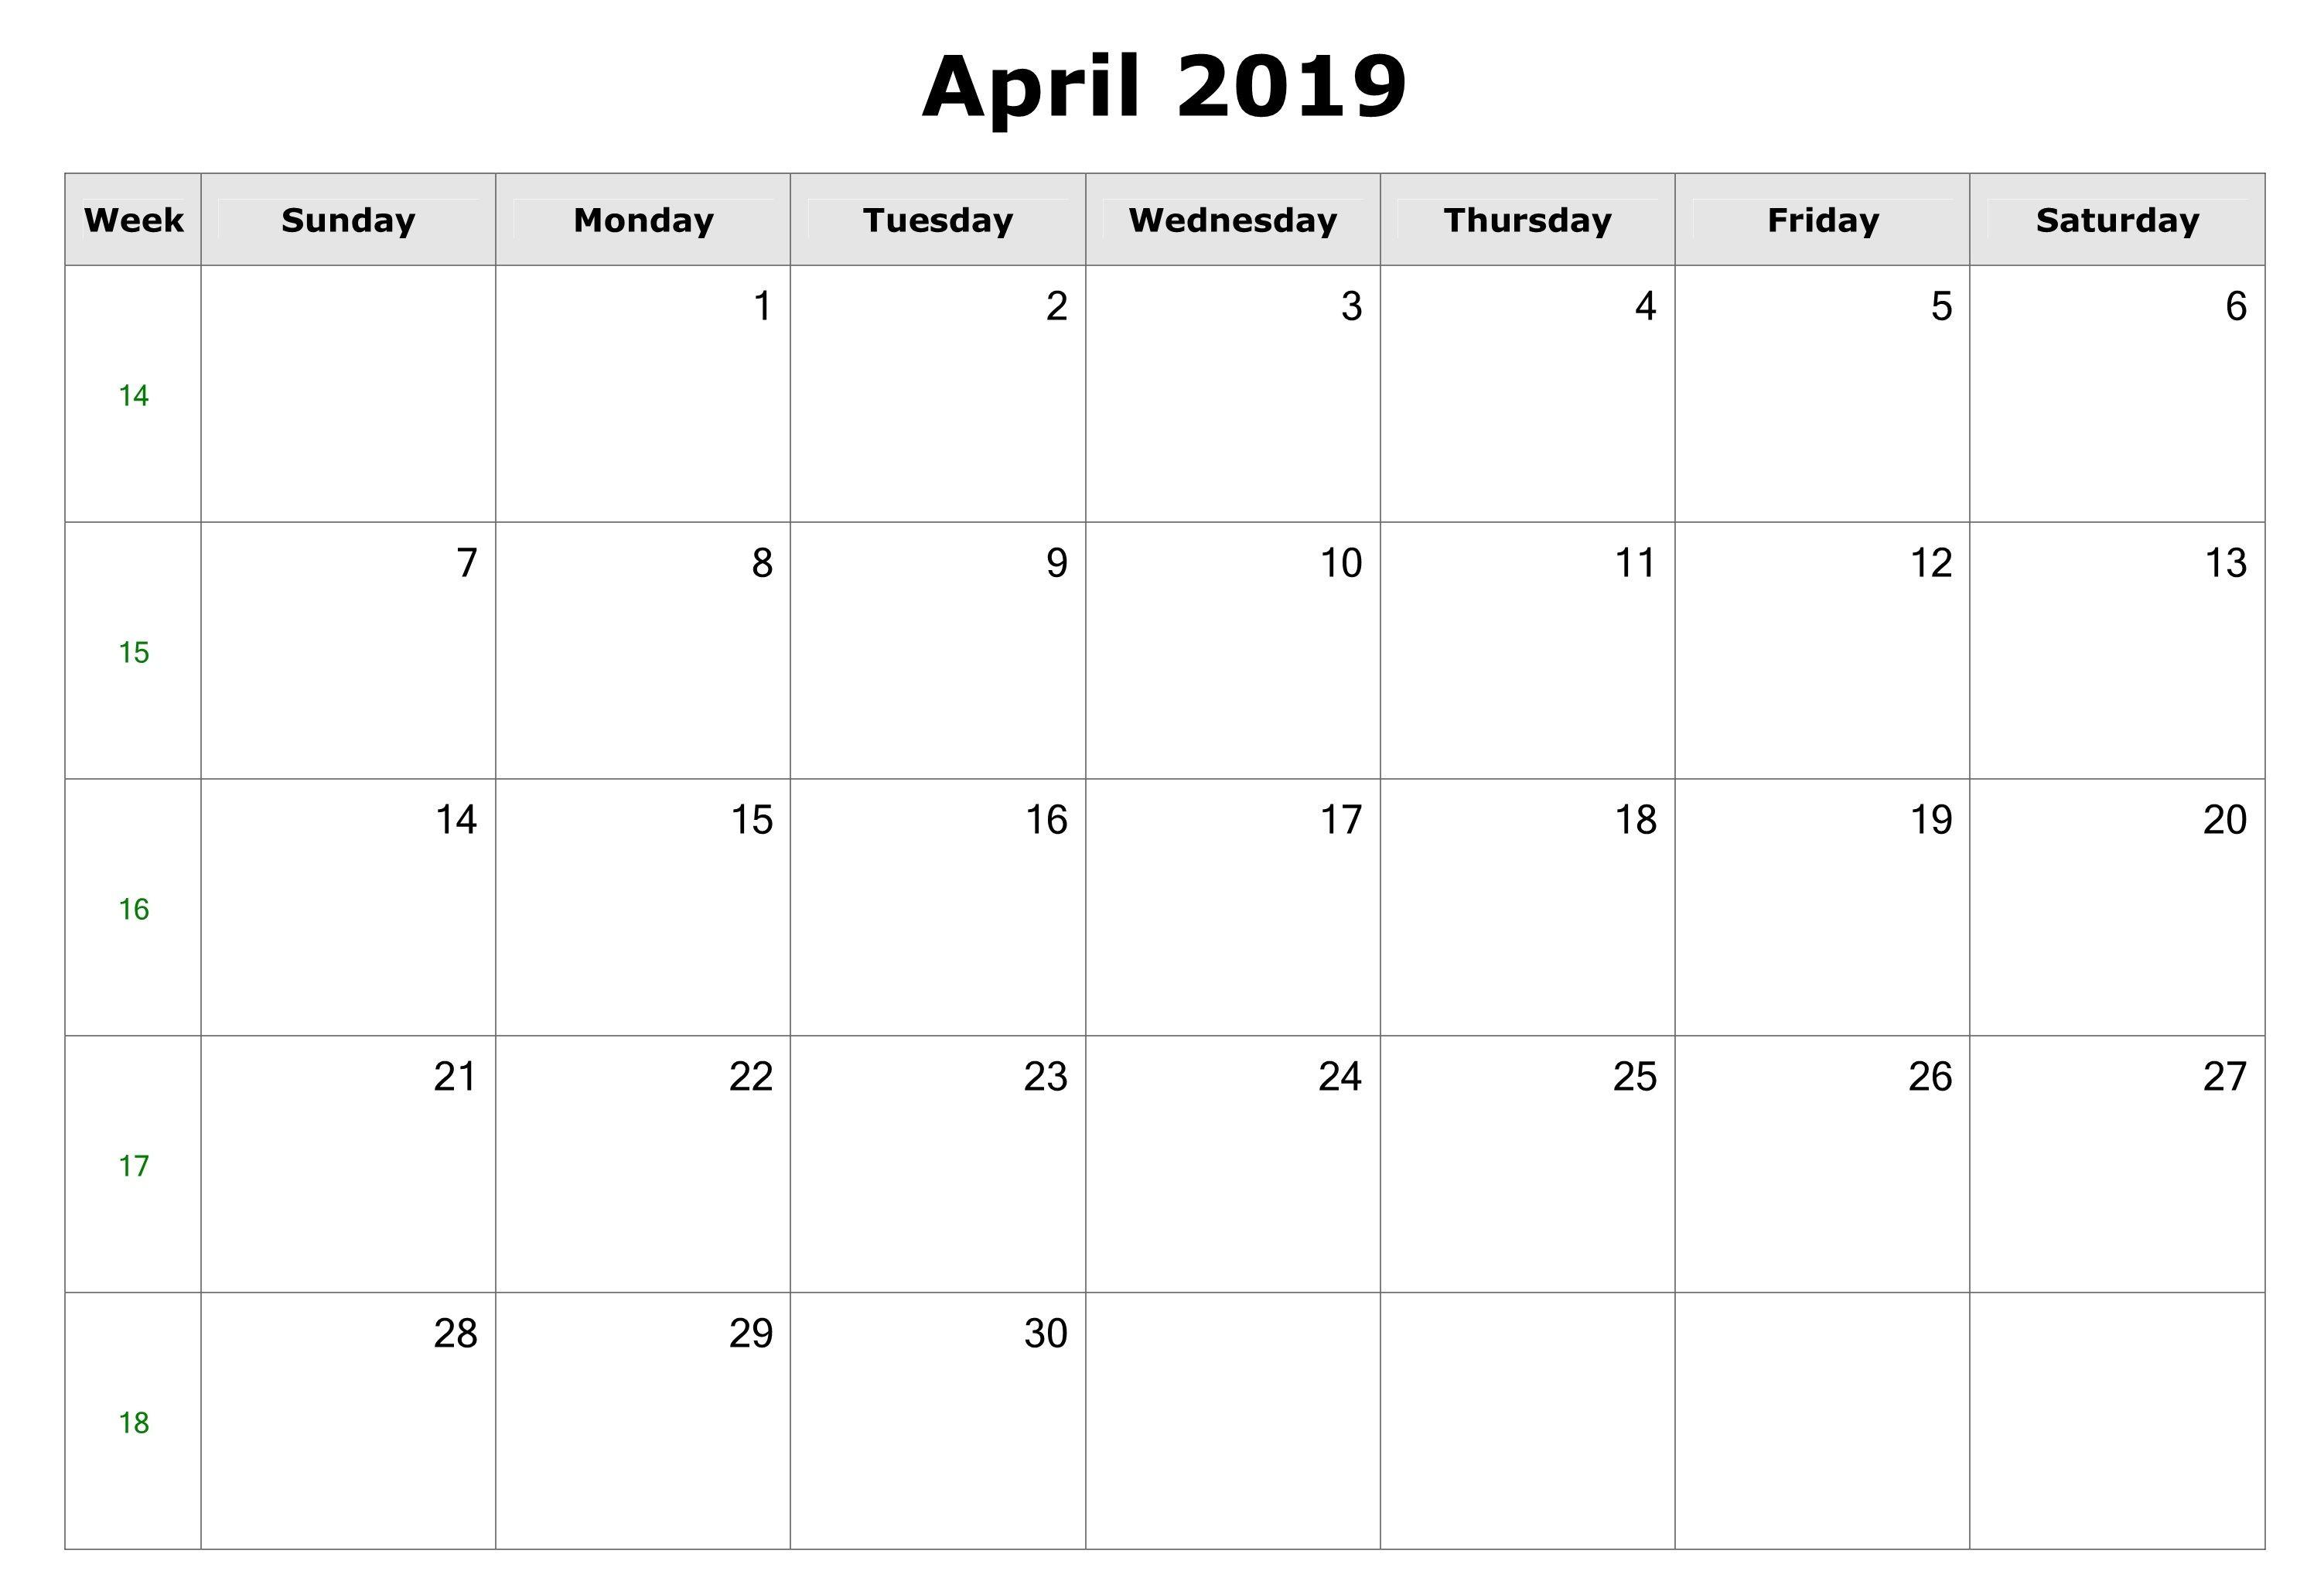 Blank April 2019 Printable Calendar Download | Printable Within Create Your Own Calendar Printable